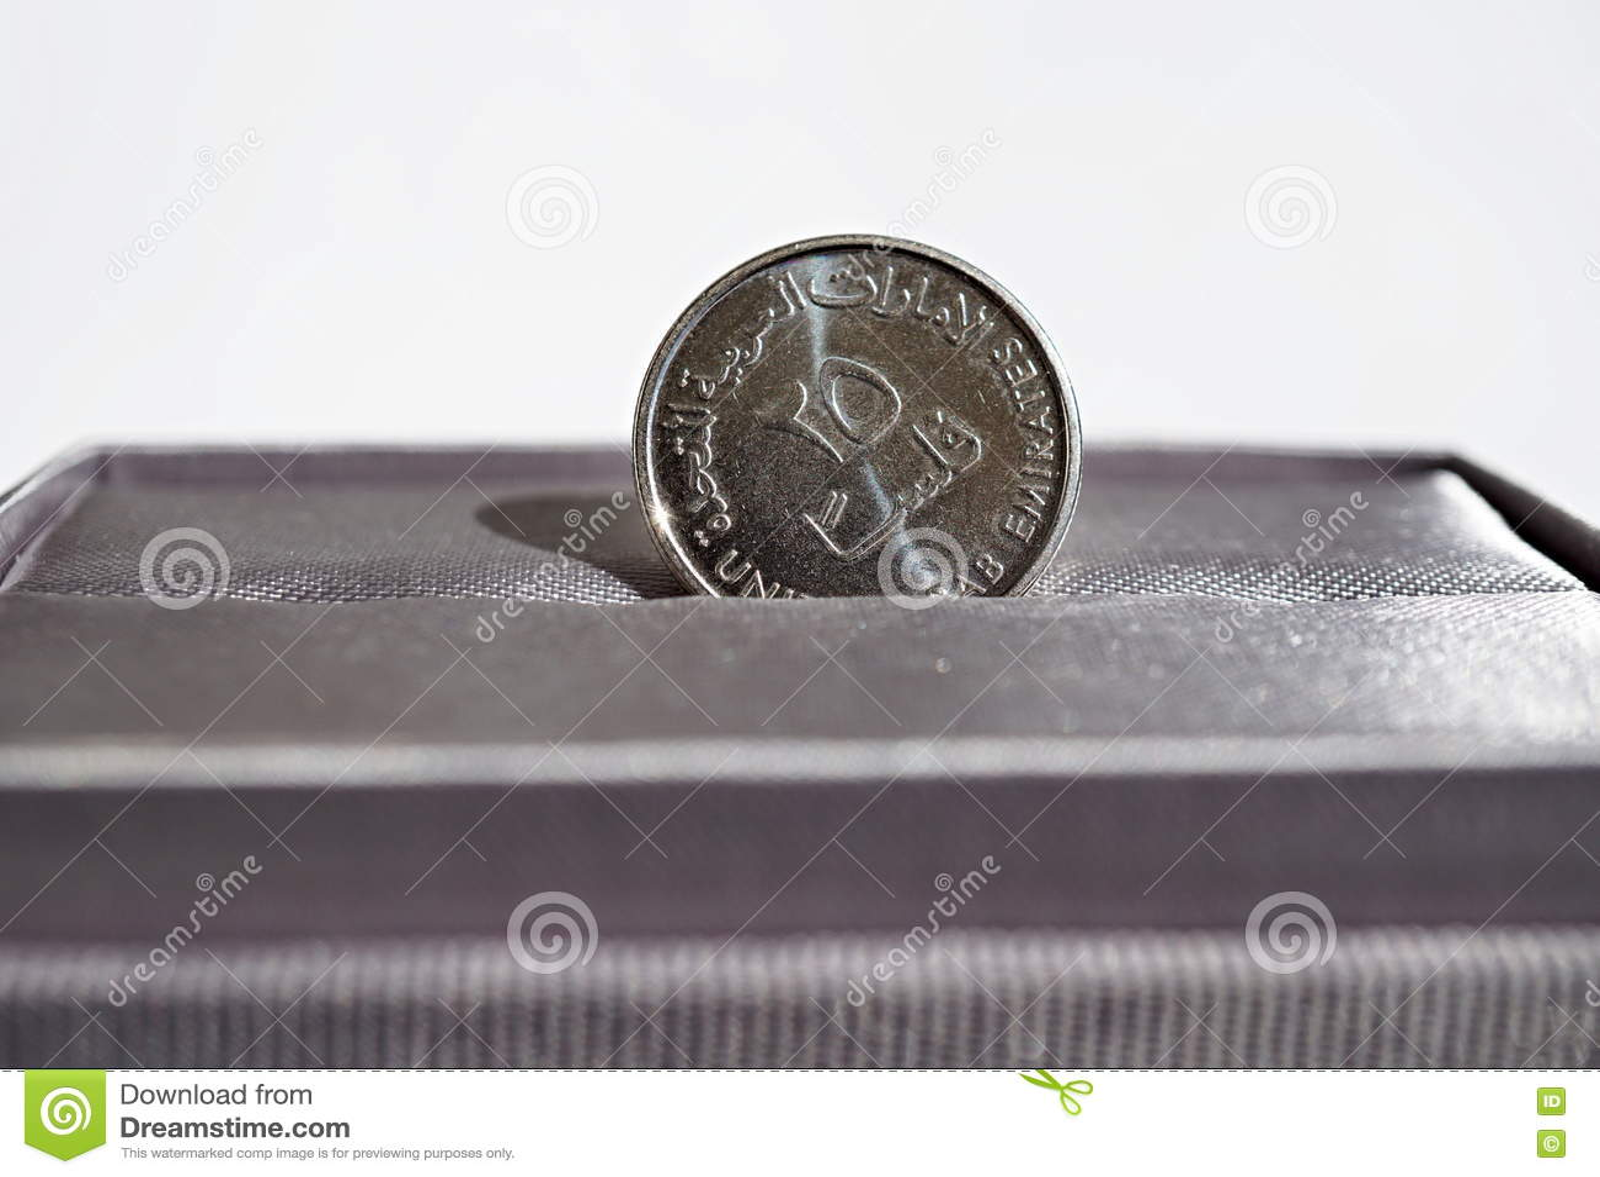 Macro Detail Of A Silver Coin Of Dirham United Arab Emirates Dirham